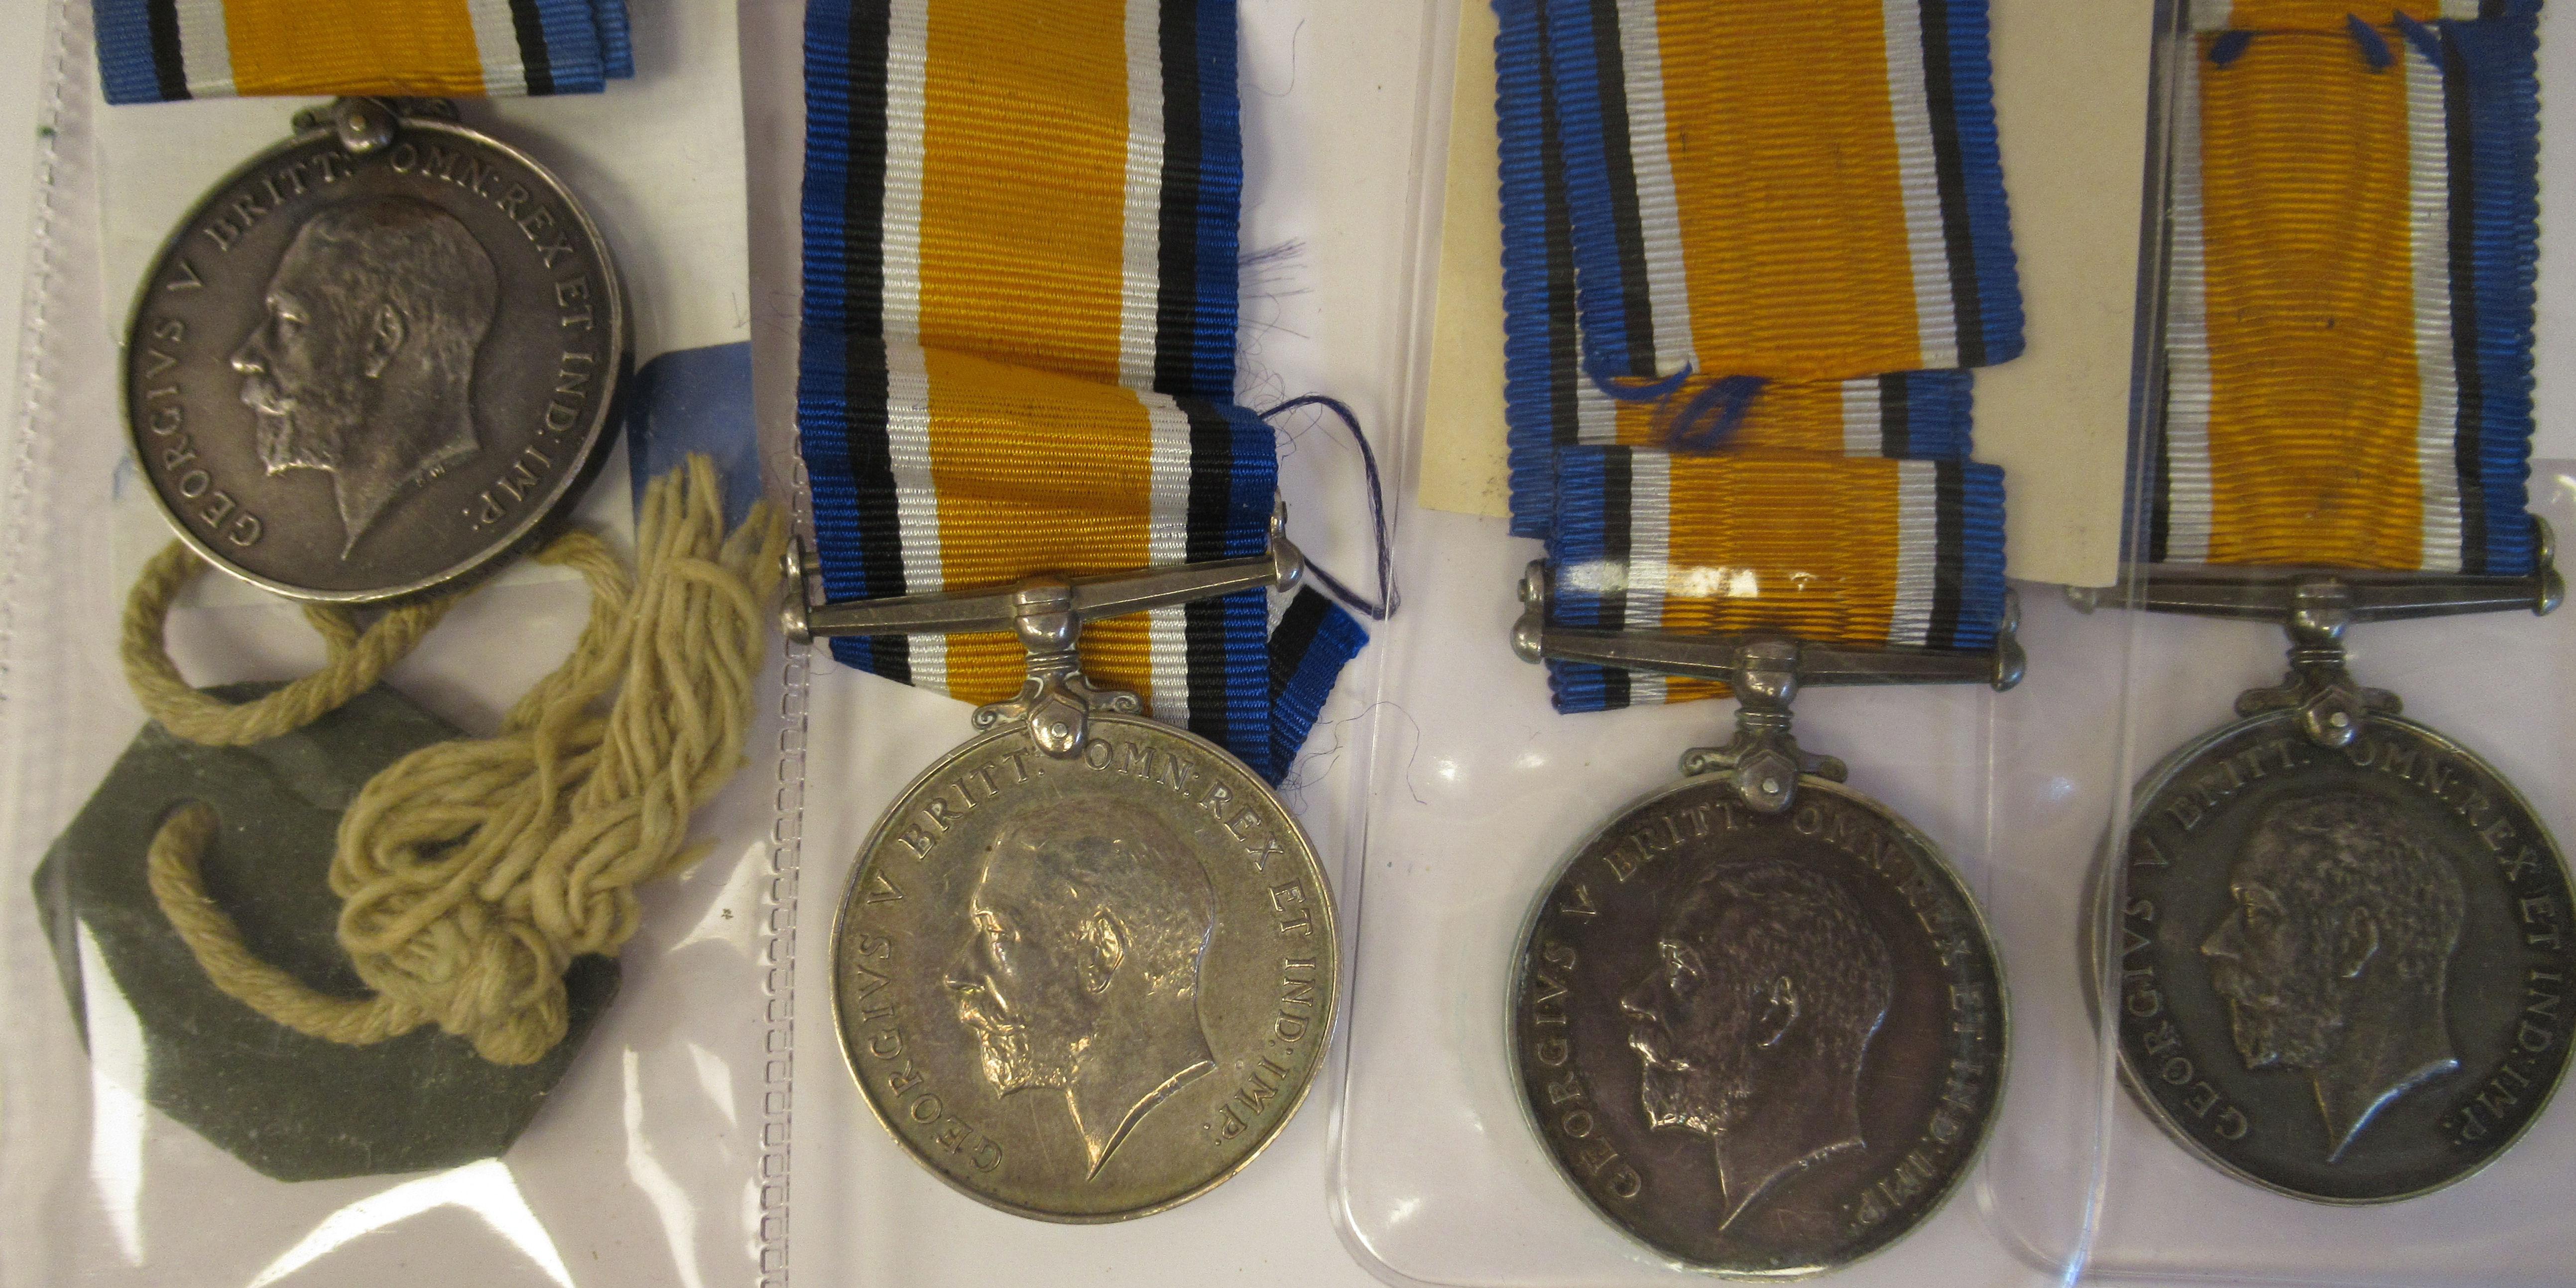 Twenty-four Great War 1914-1918 British service medals on ribbons, viz. 46481, Gnr. E. Williamson - Image 15 of 16